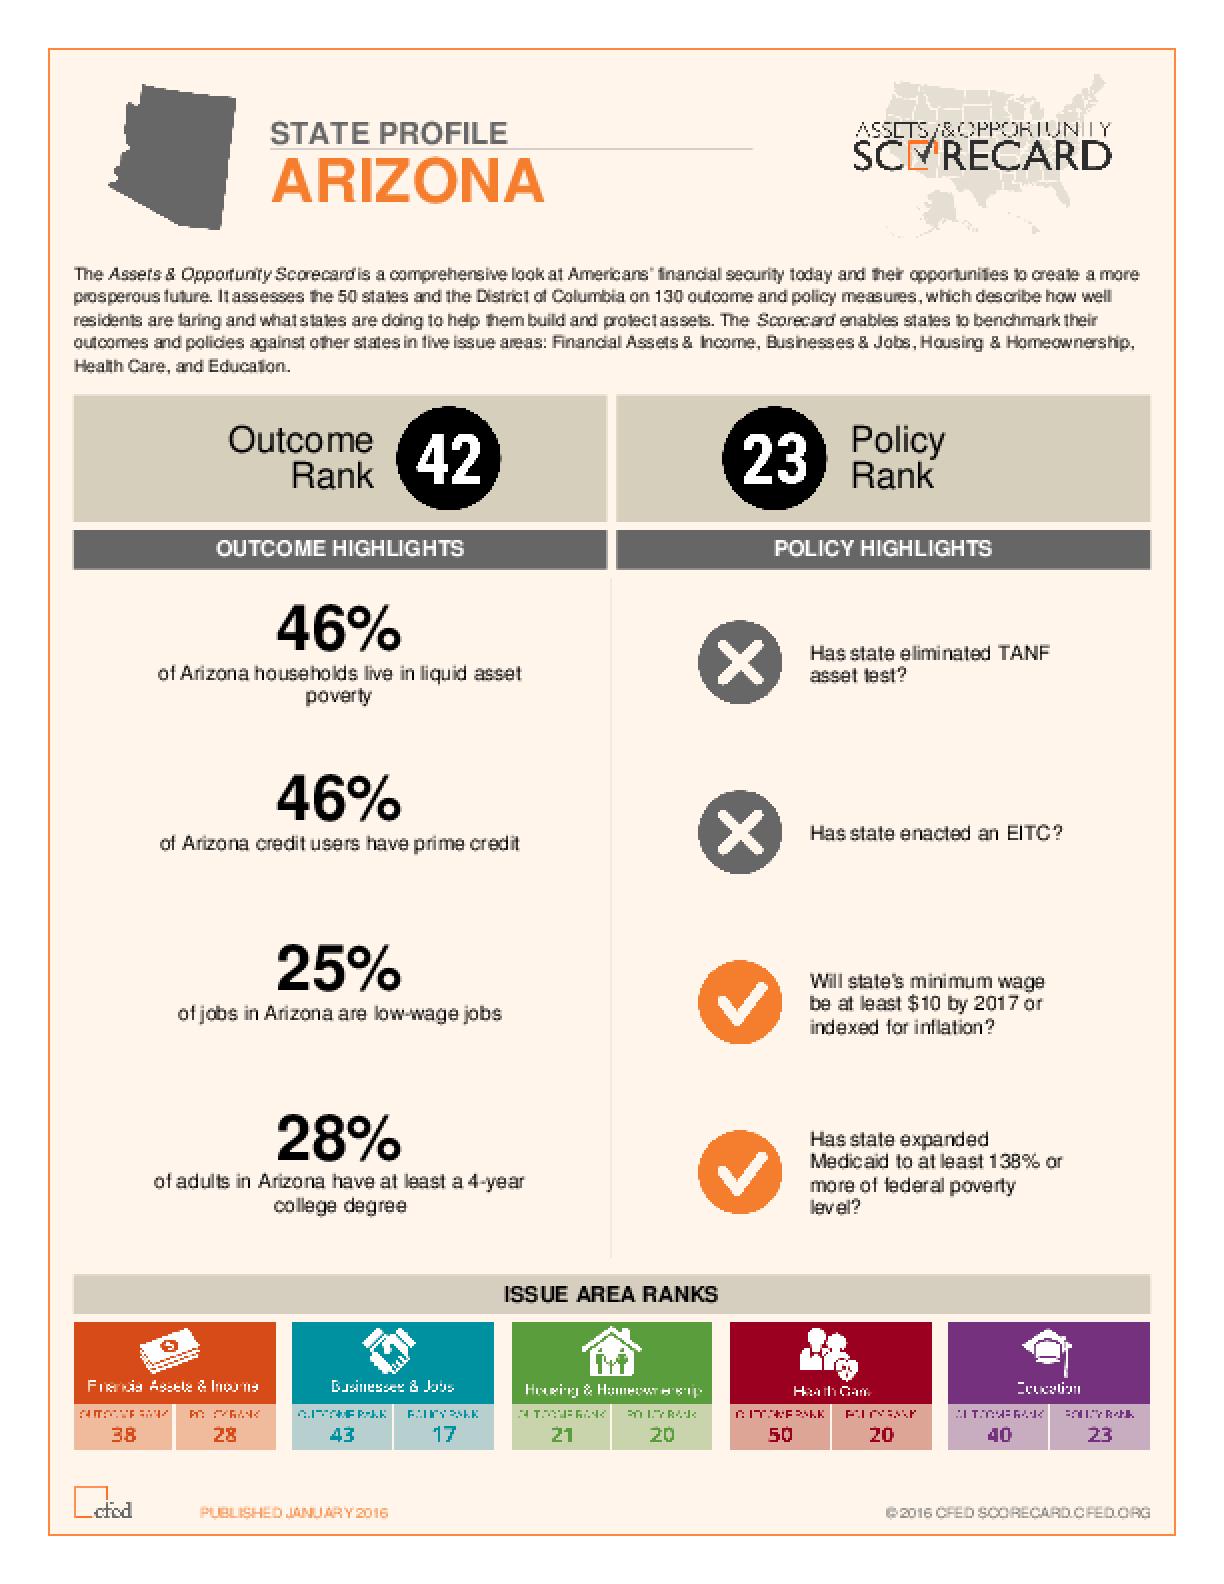 State Profile Arizona: Assets and Opportunity Scorecard